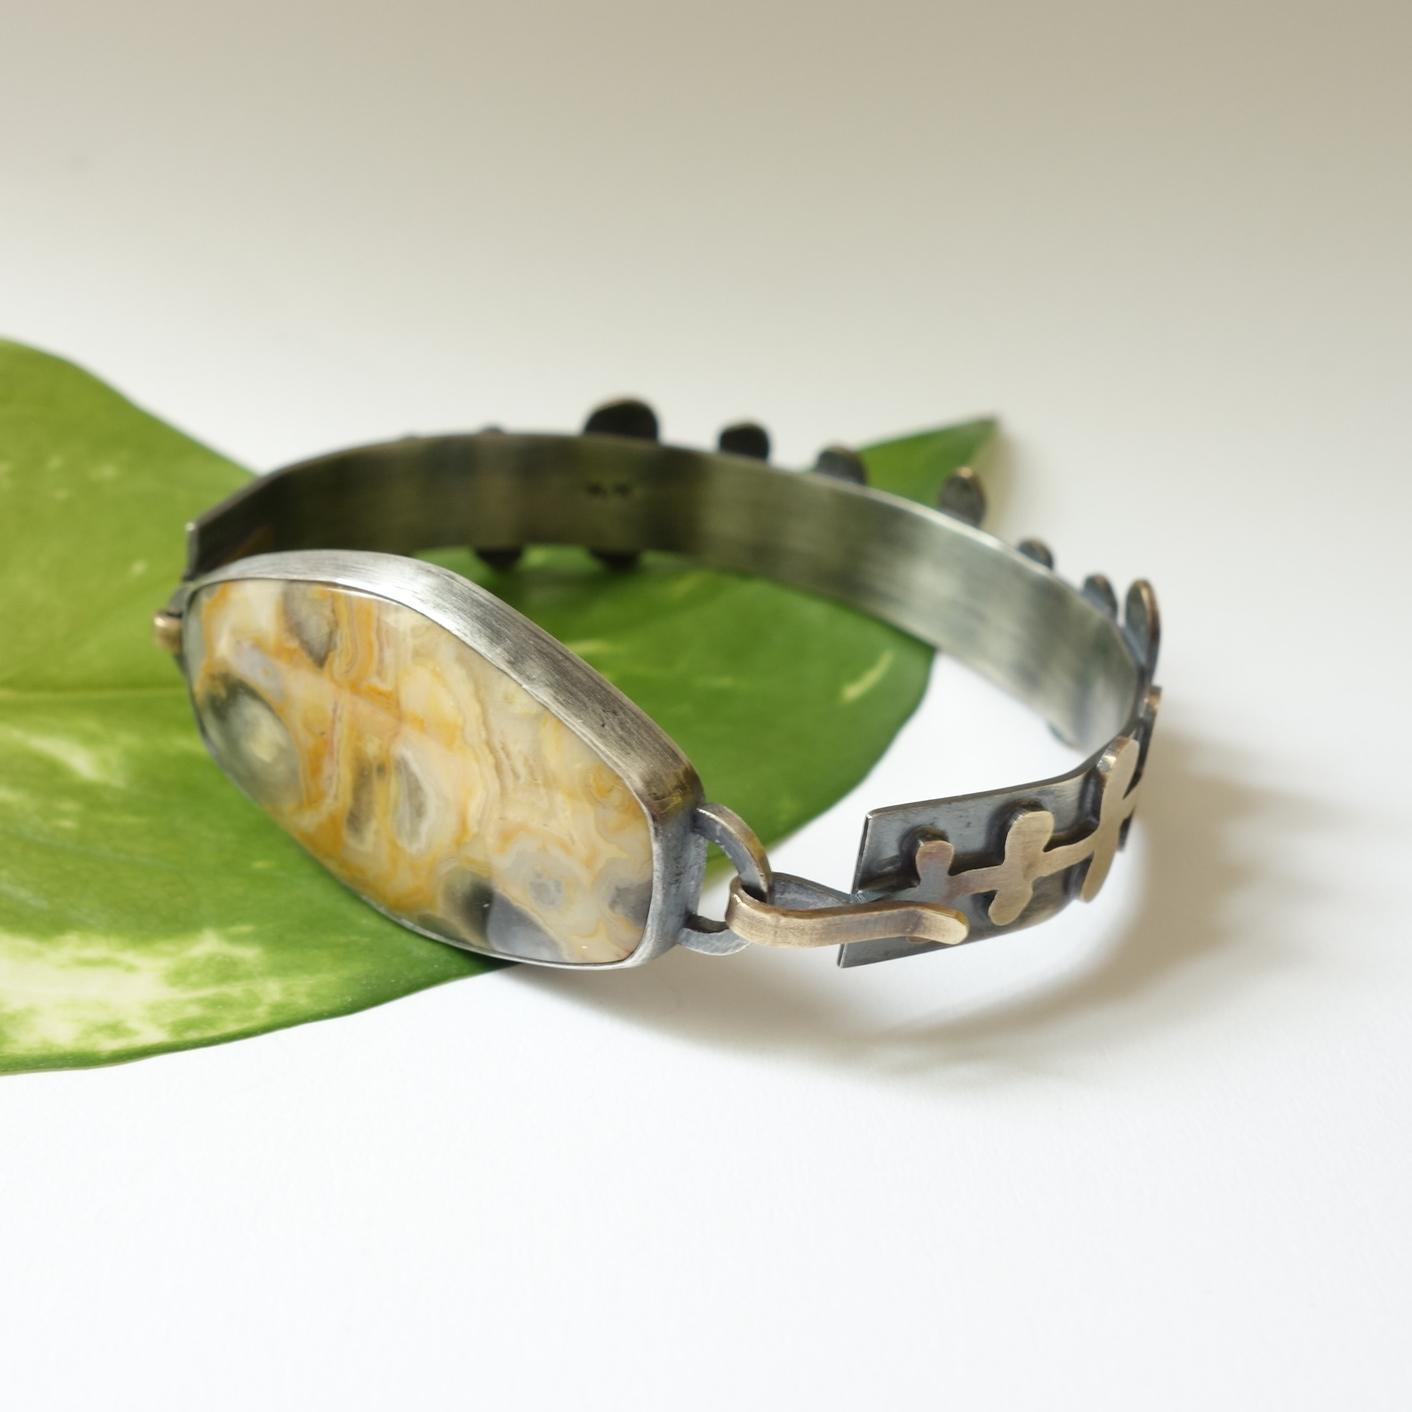 Whimsical Fern Bracelet kansas city merit made meritmade kc handmade jewelry art jewelry unique jewelry